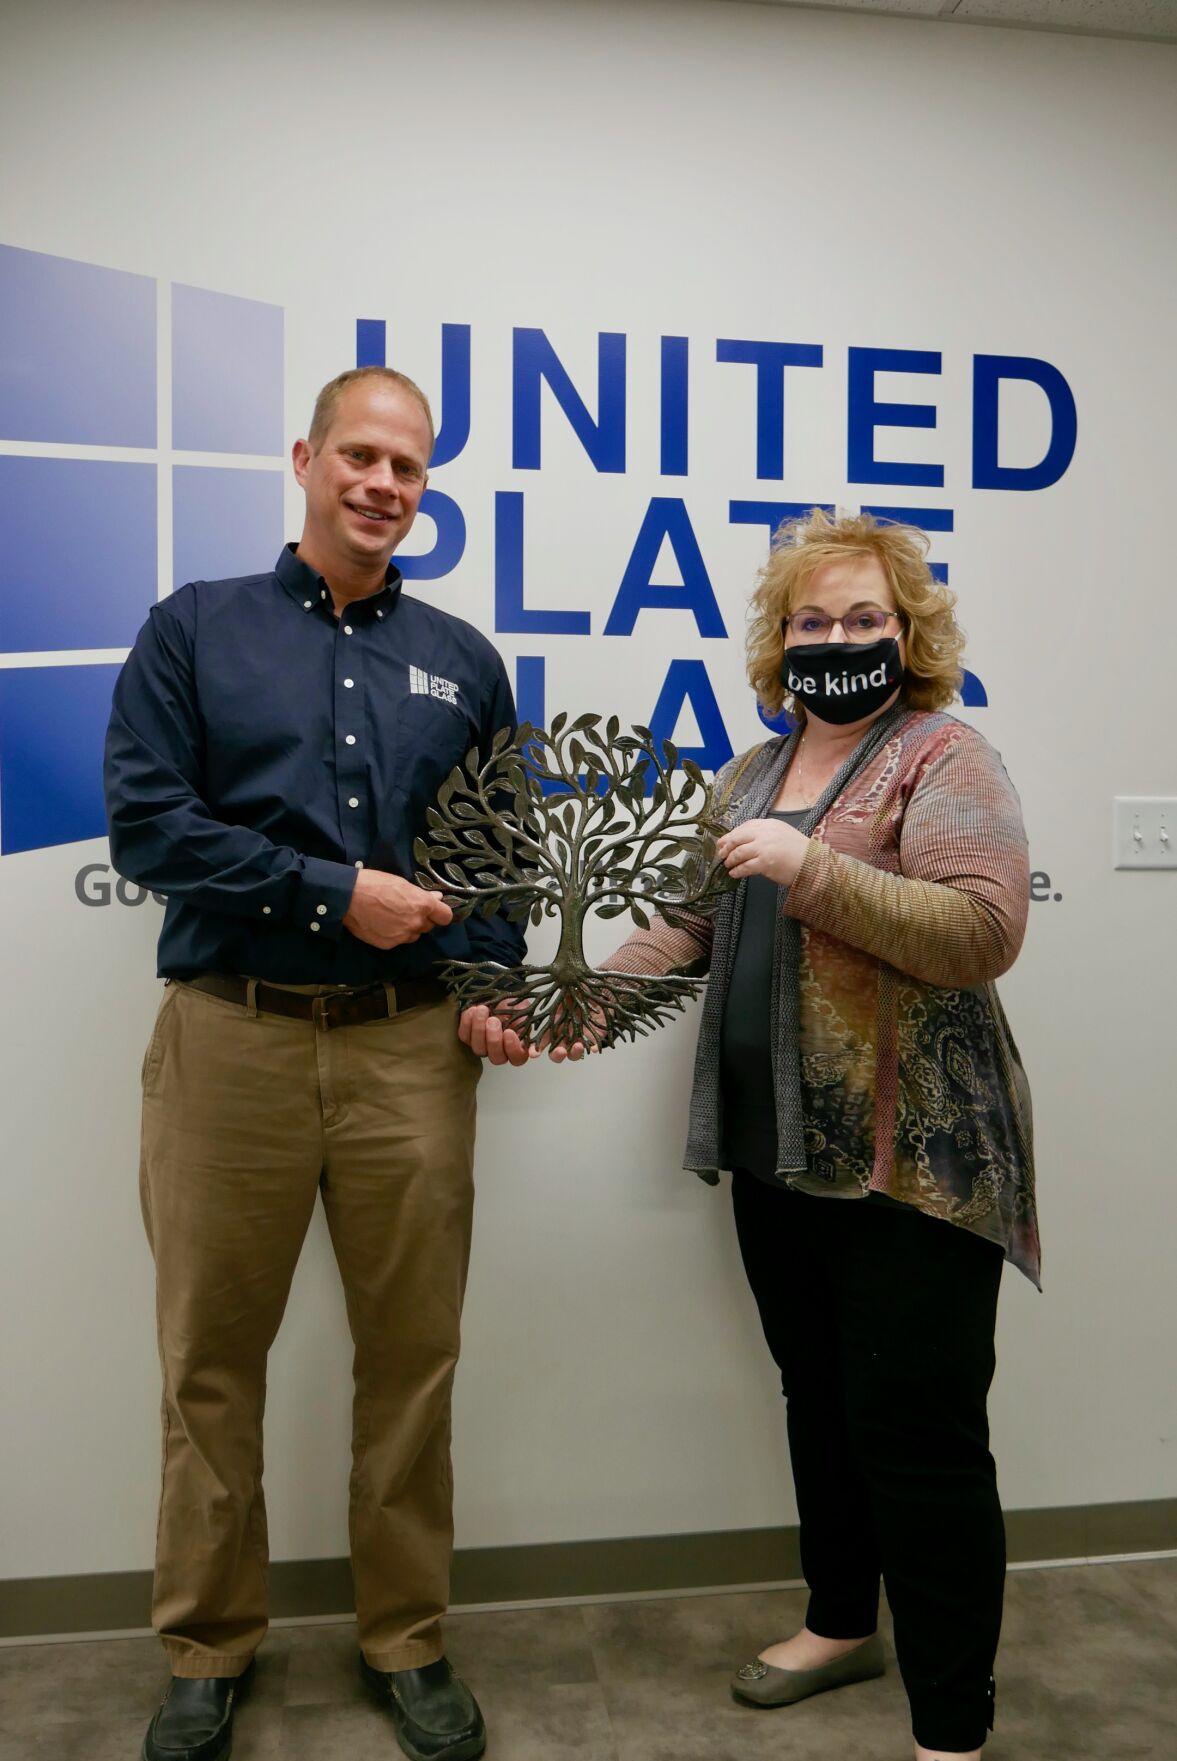 United Plate Glass.jpeg